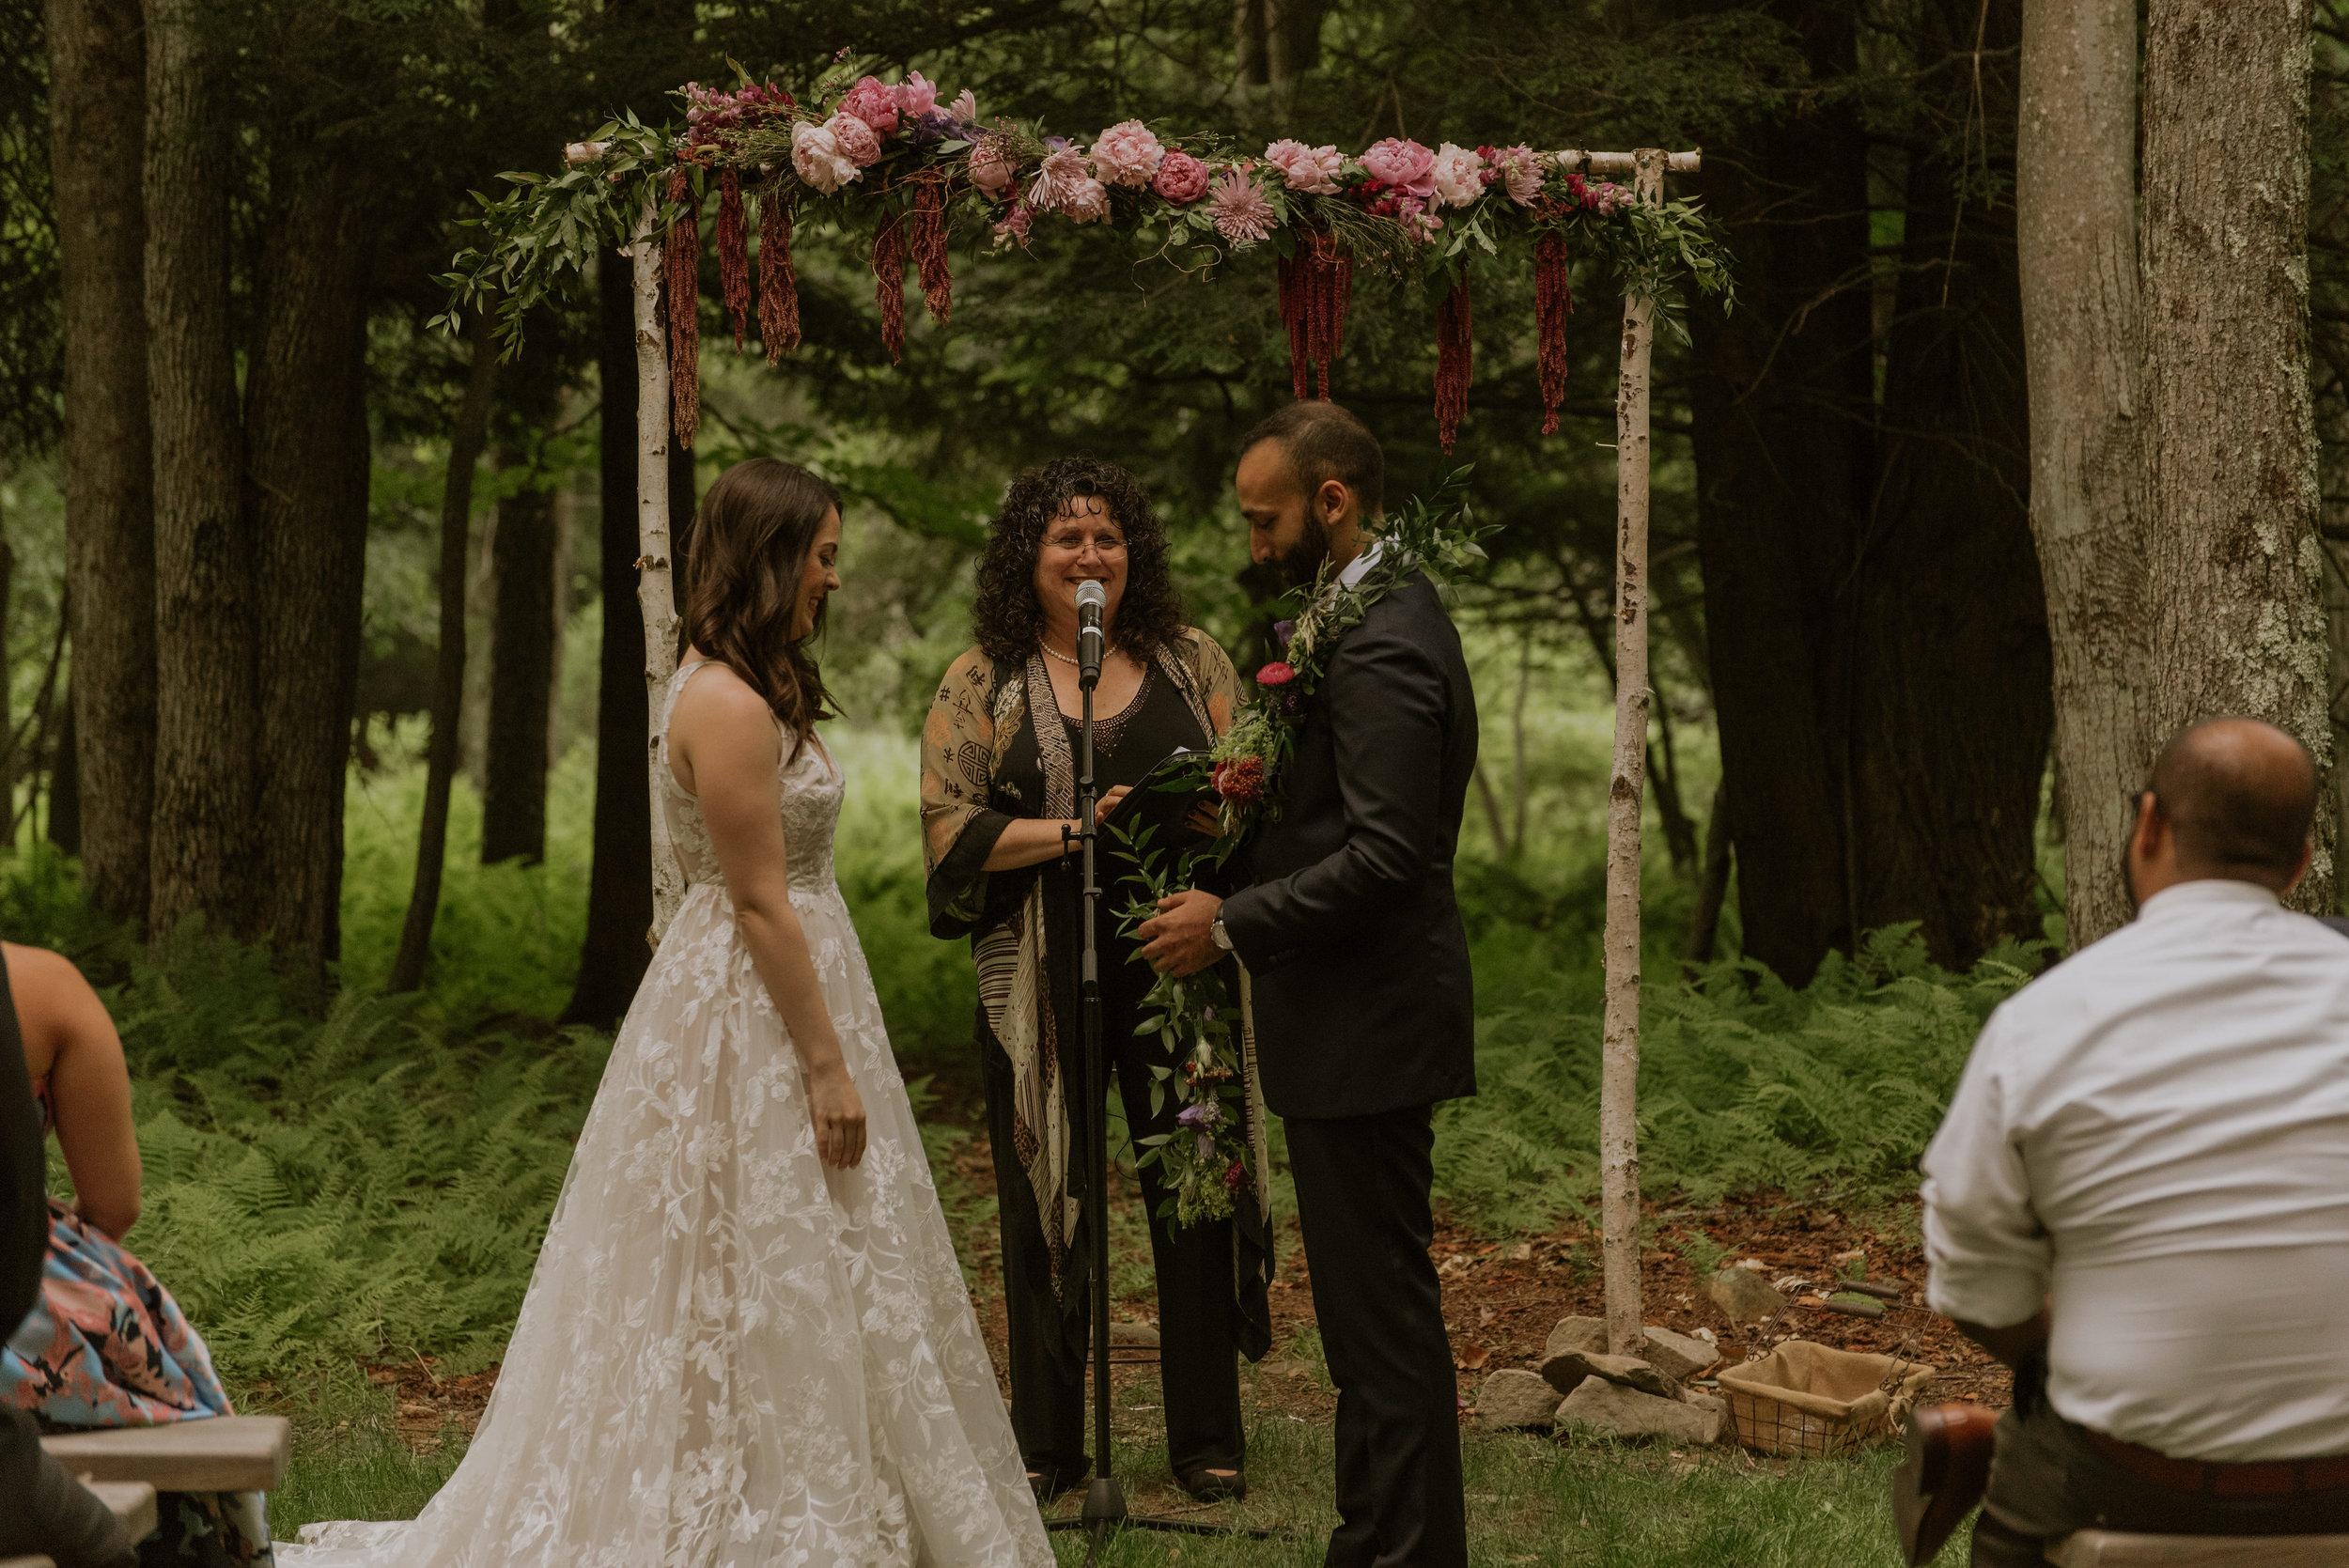 Cassandra-Anu-Wedding-Upstate-Catskills-Summer-Meadowlark-Stills-Lawrence-Braun-FINAL-0433.jpg